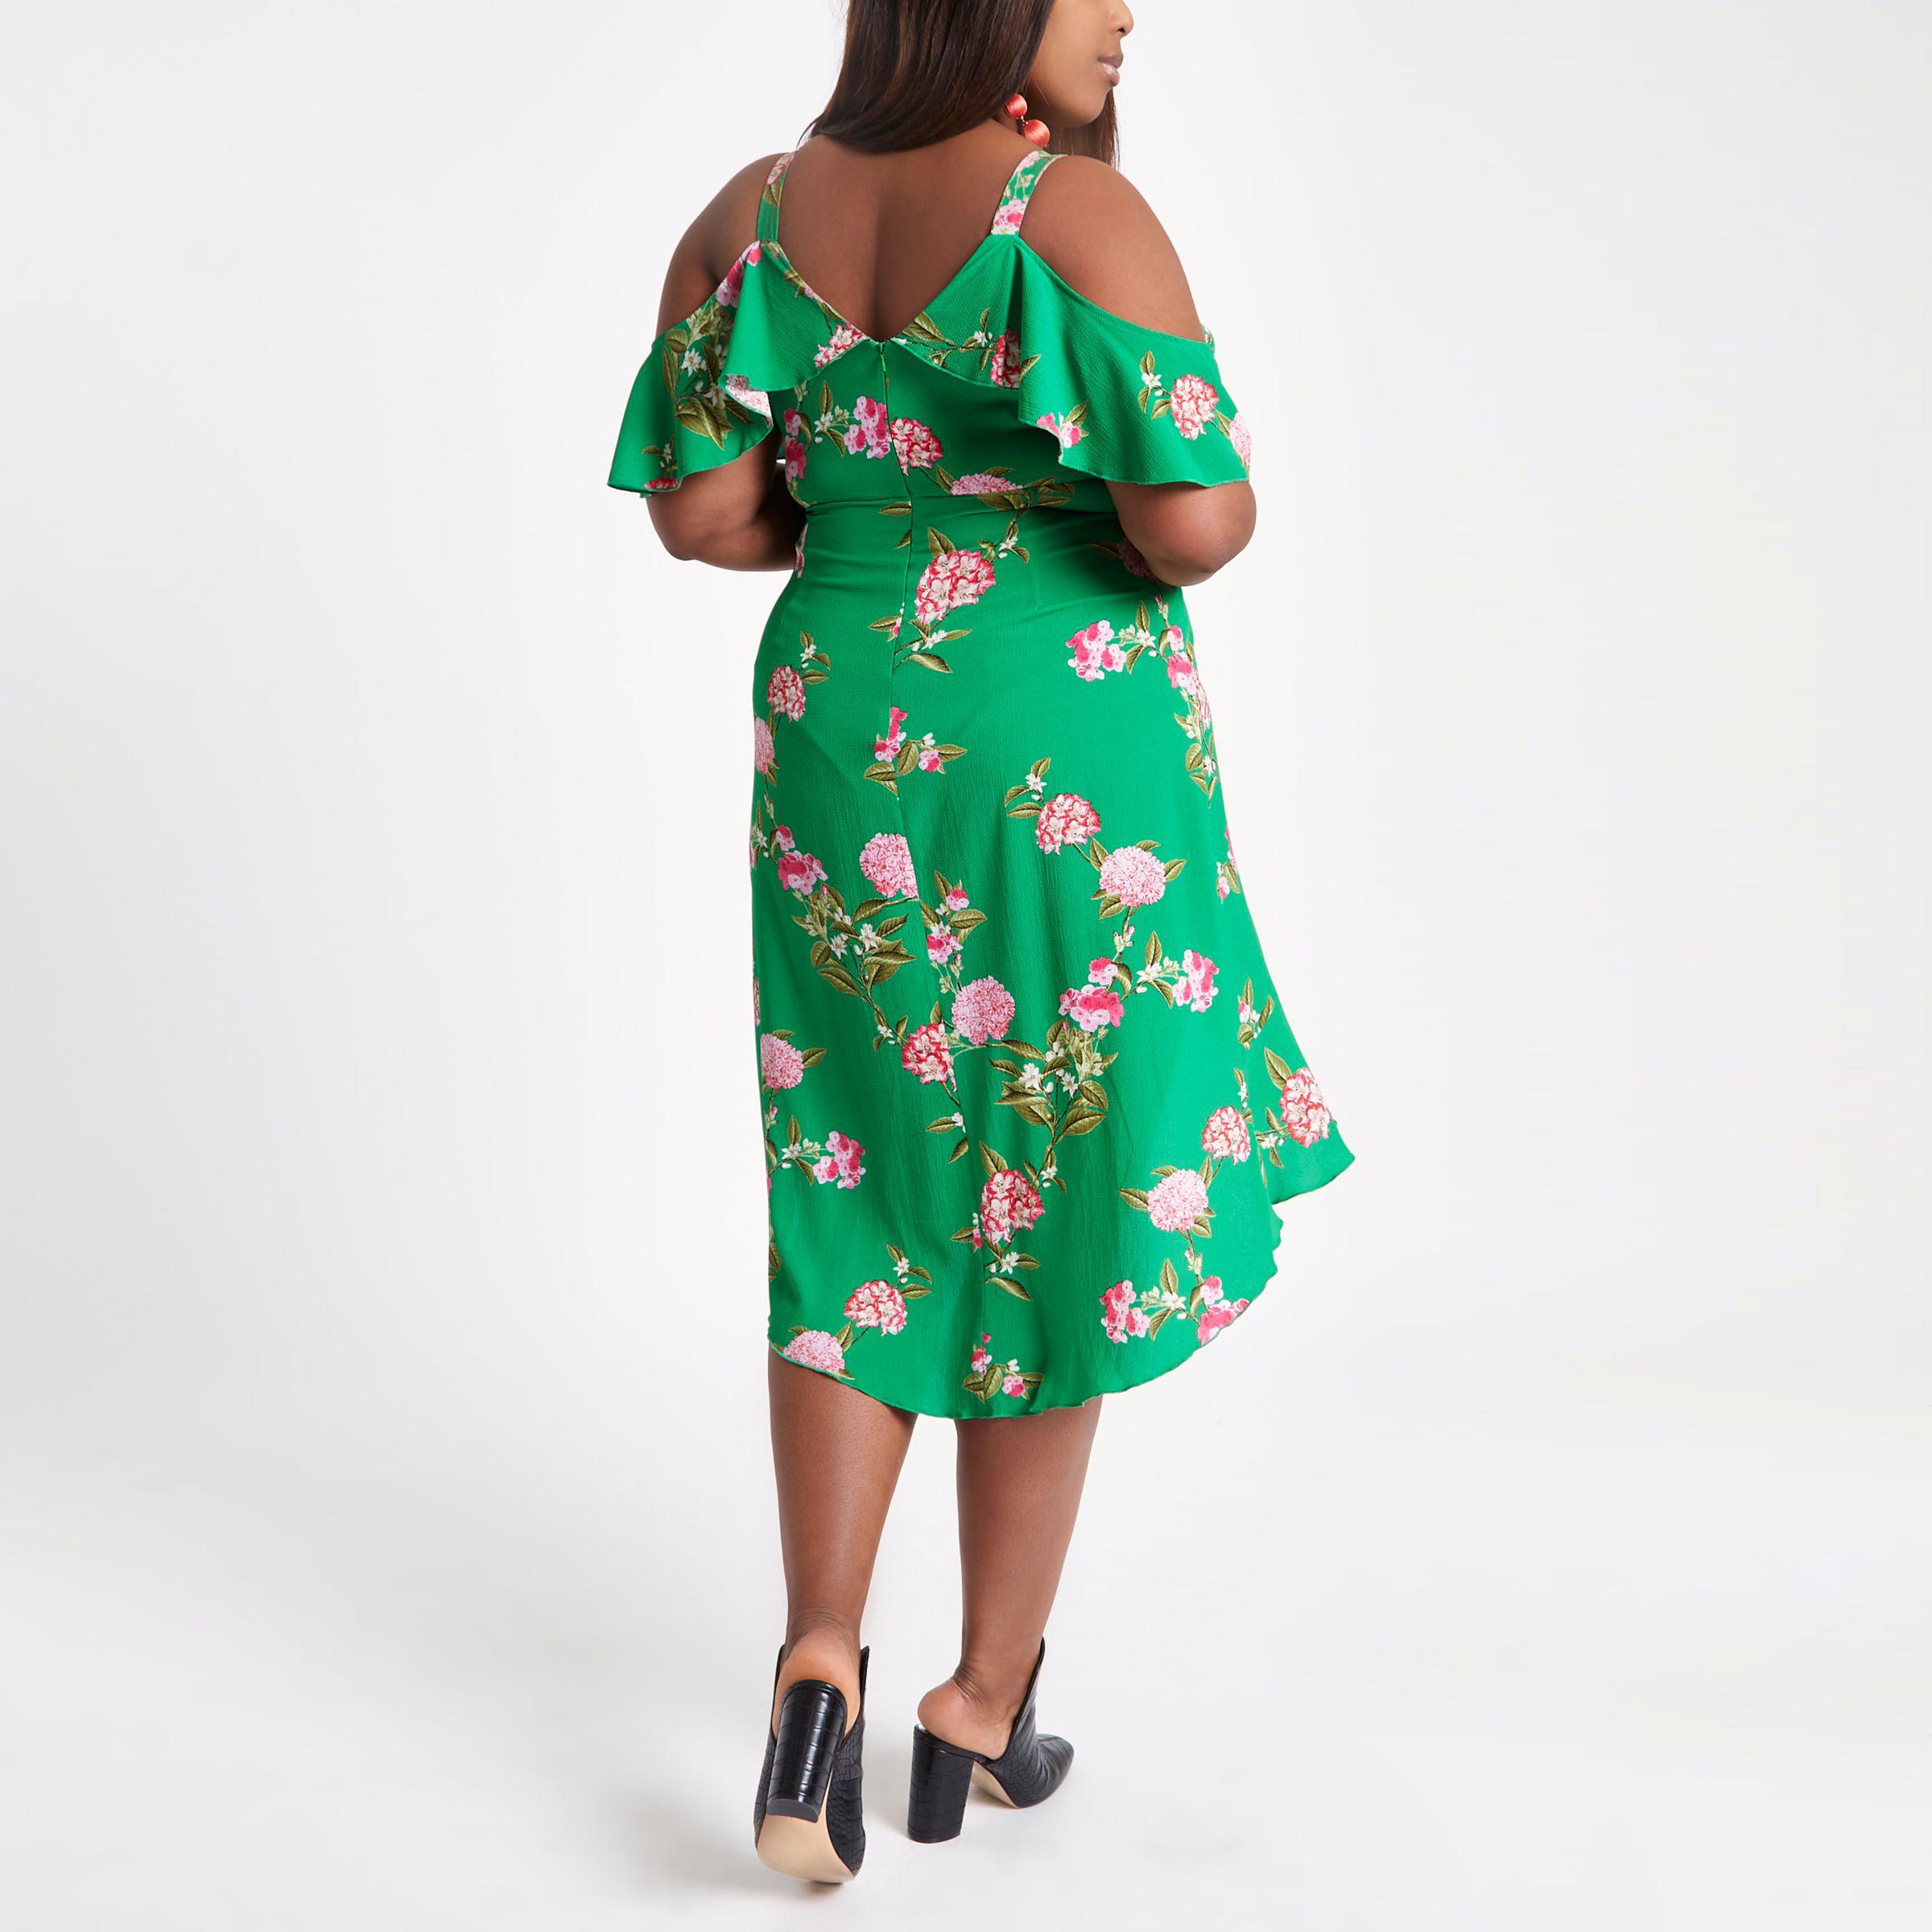 c83f987adf2 Lyst - River Island Plus Floral Cold Shoulder Midi Dress in Green